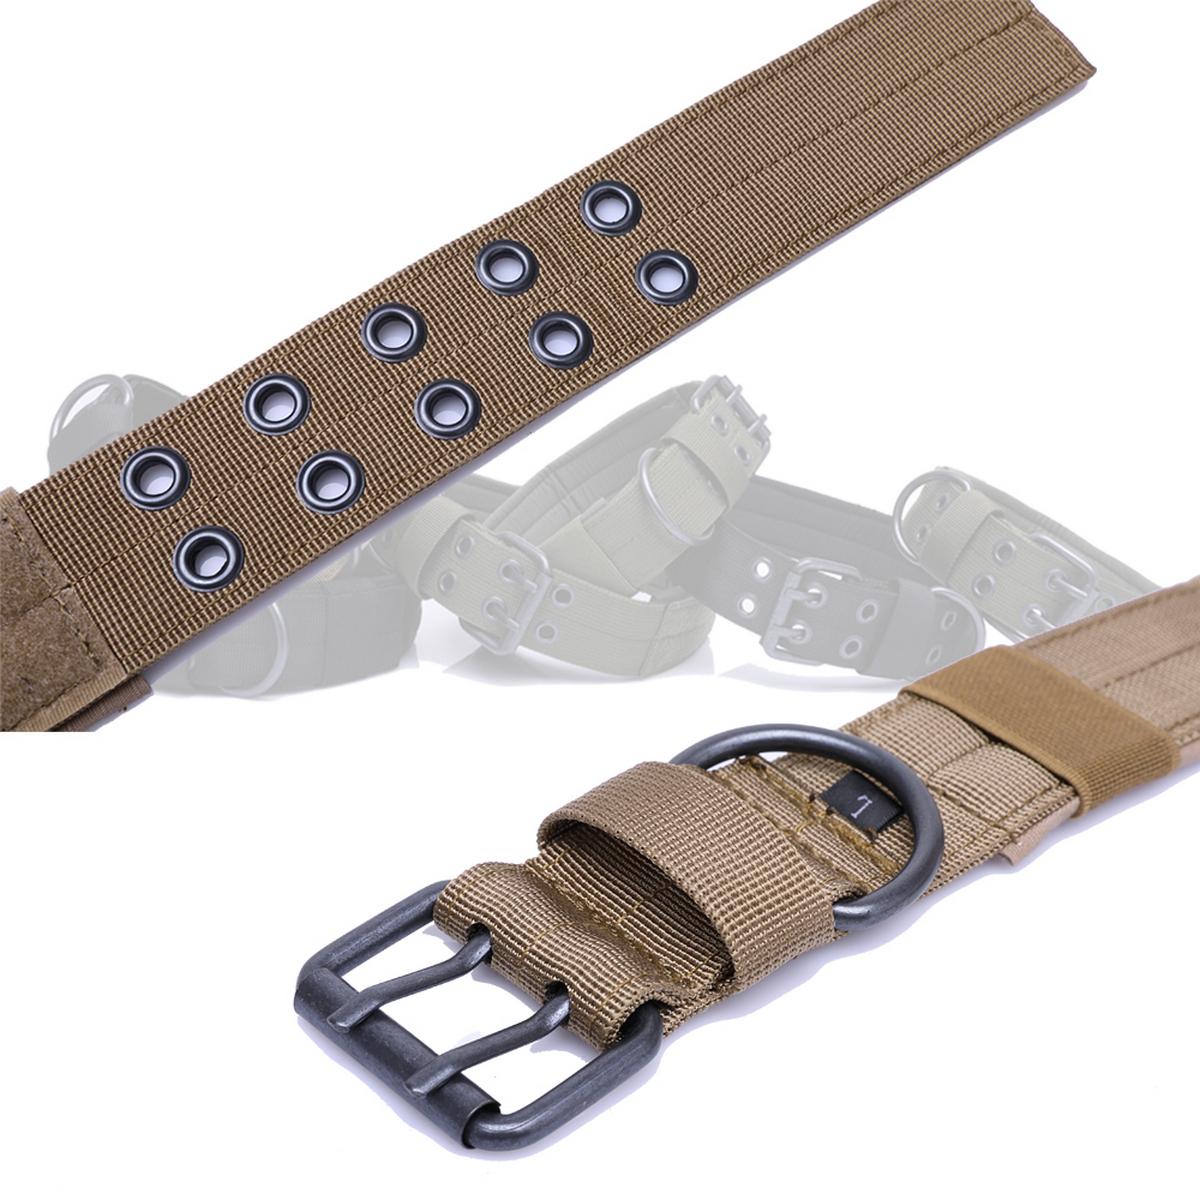 Tactical-Scorpion-Gear-Dog-Collar-Canine-K9-Training-Walking-Military-Nylon thumbnail 11